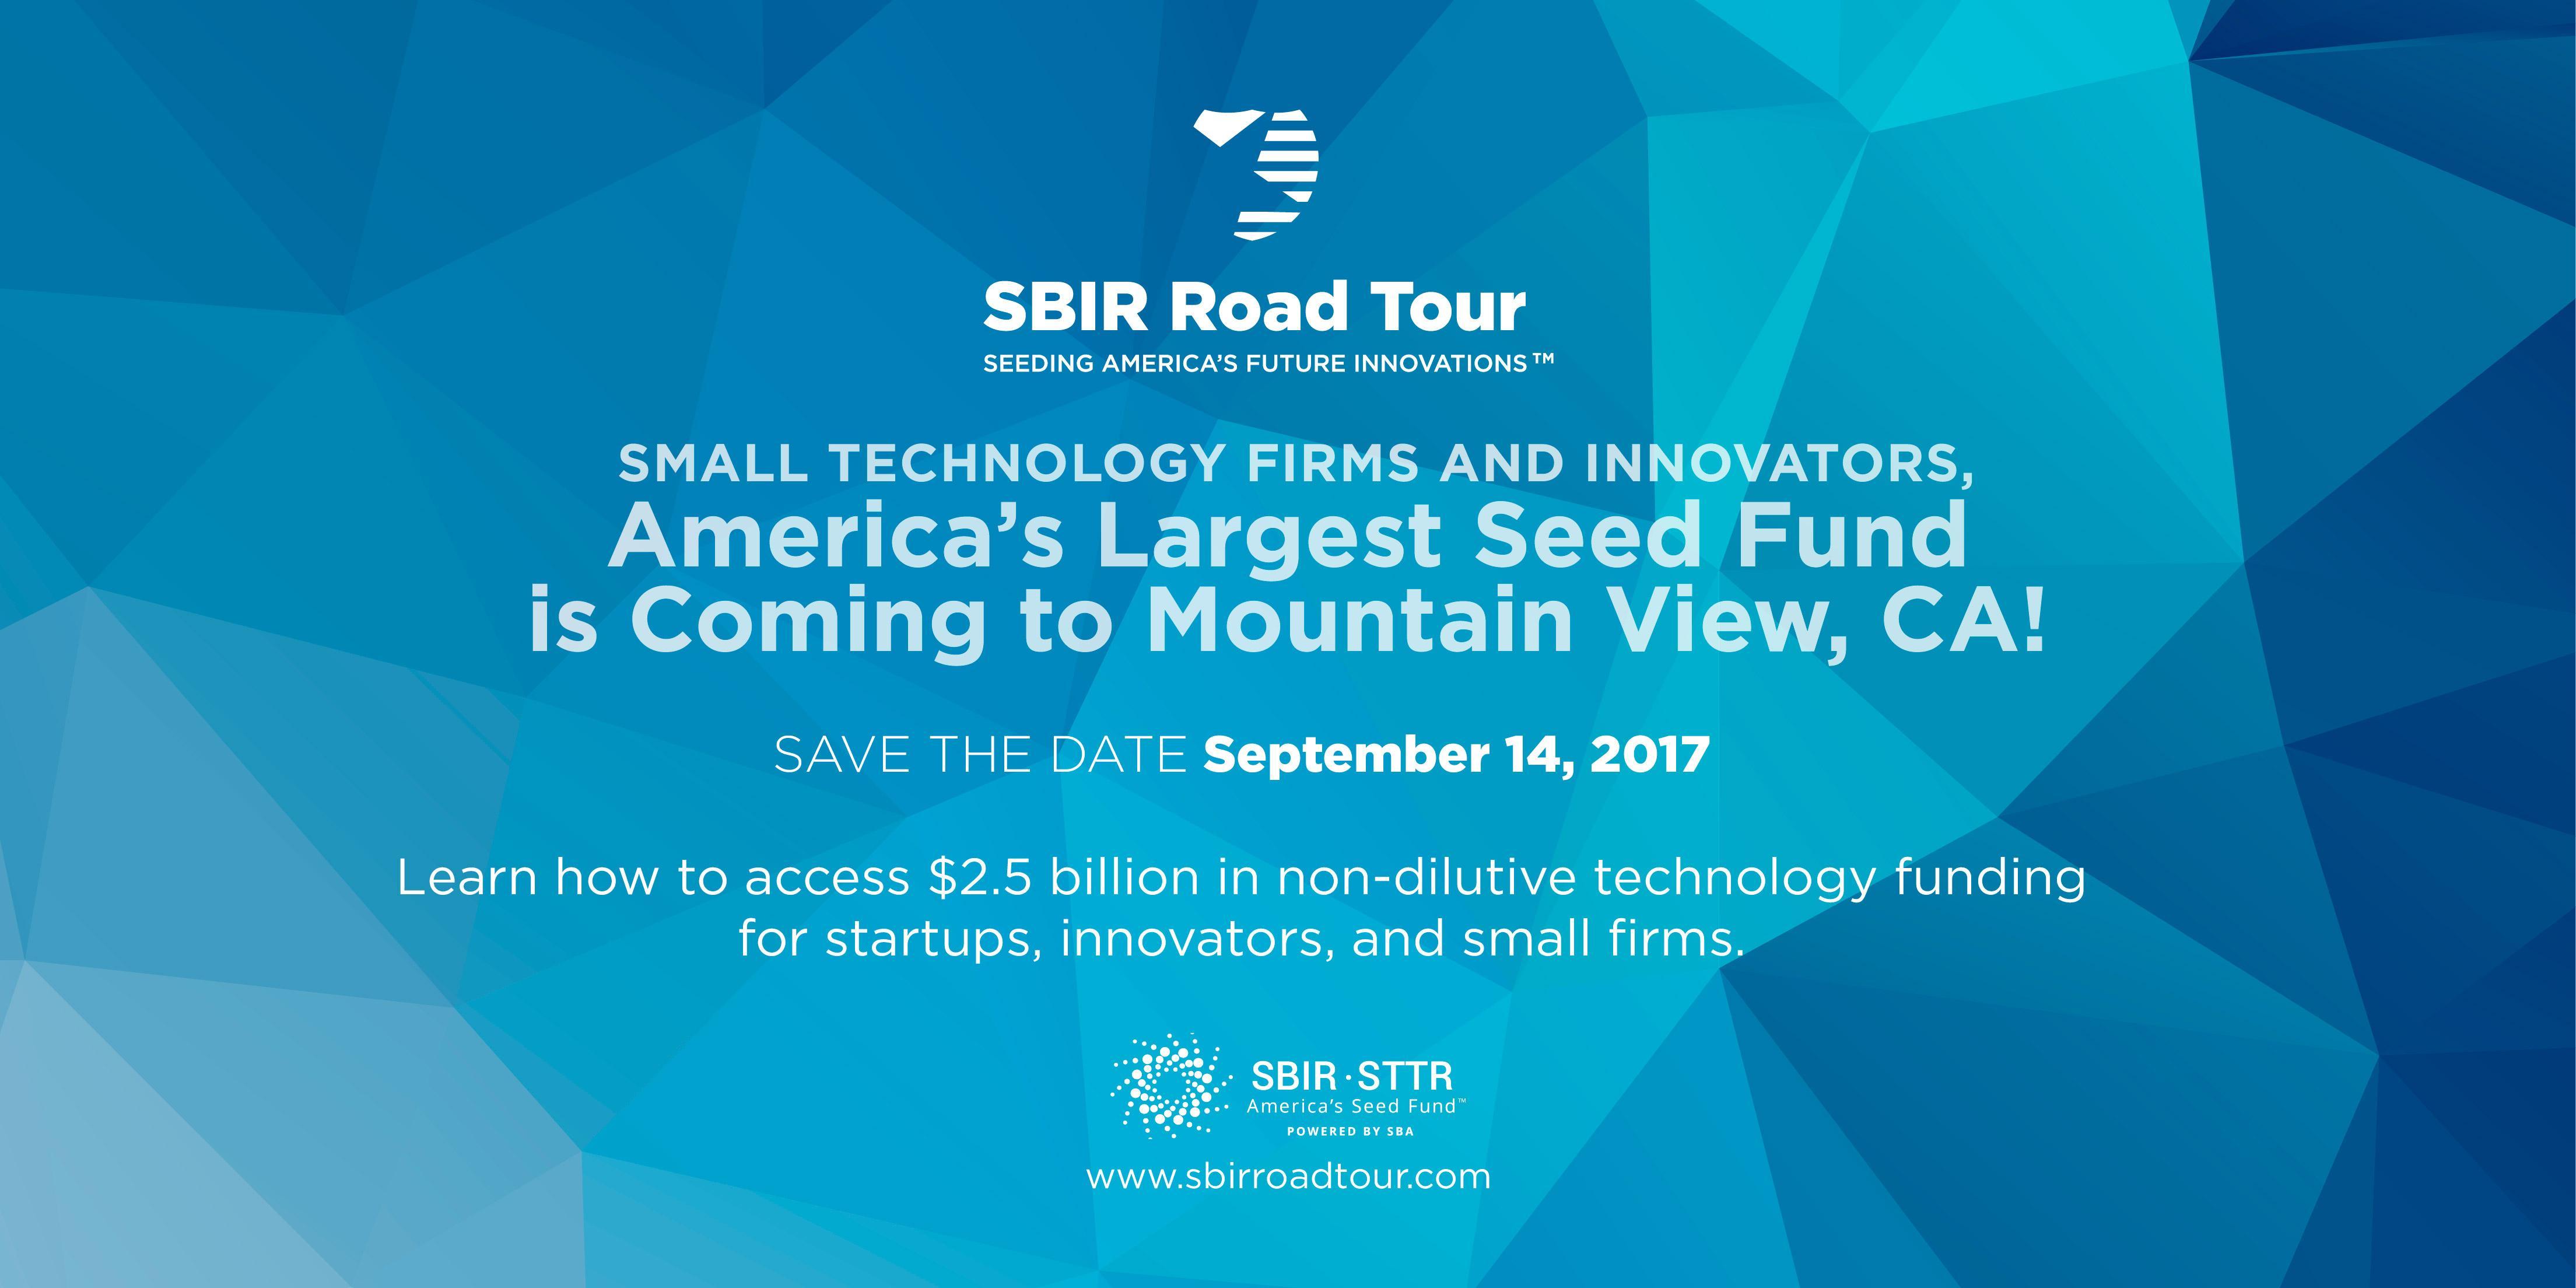 SBIR Road Tour - Mountain View, CA